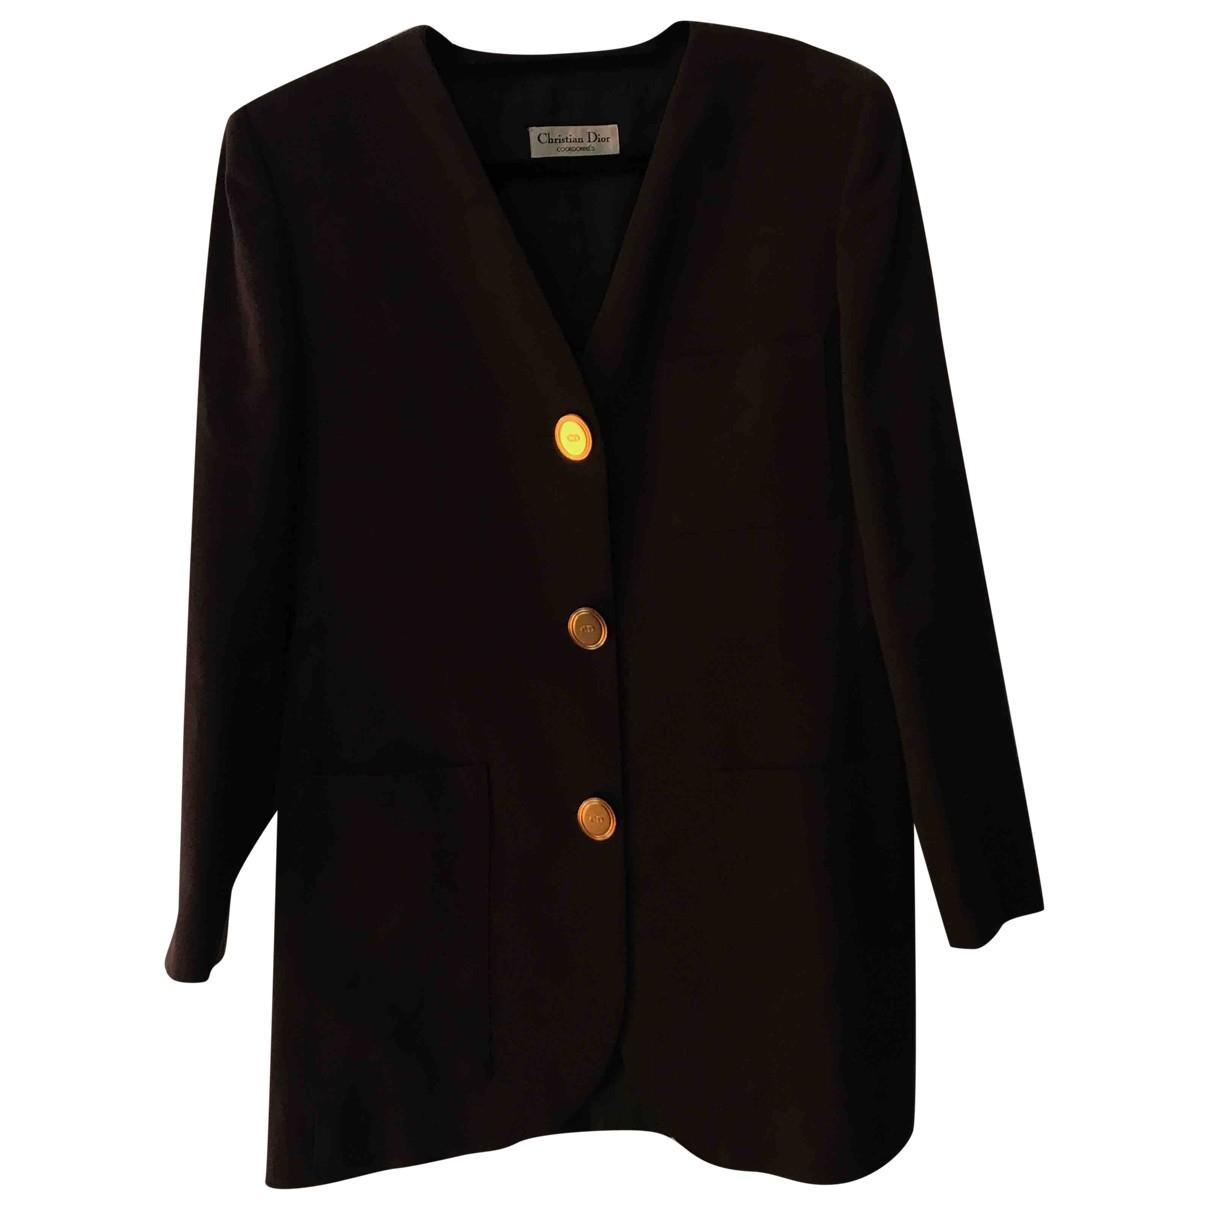 Dior \N Jacke in  Braun Wolle